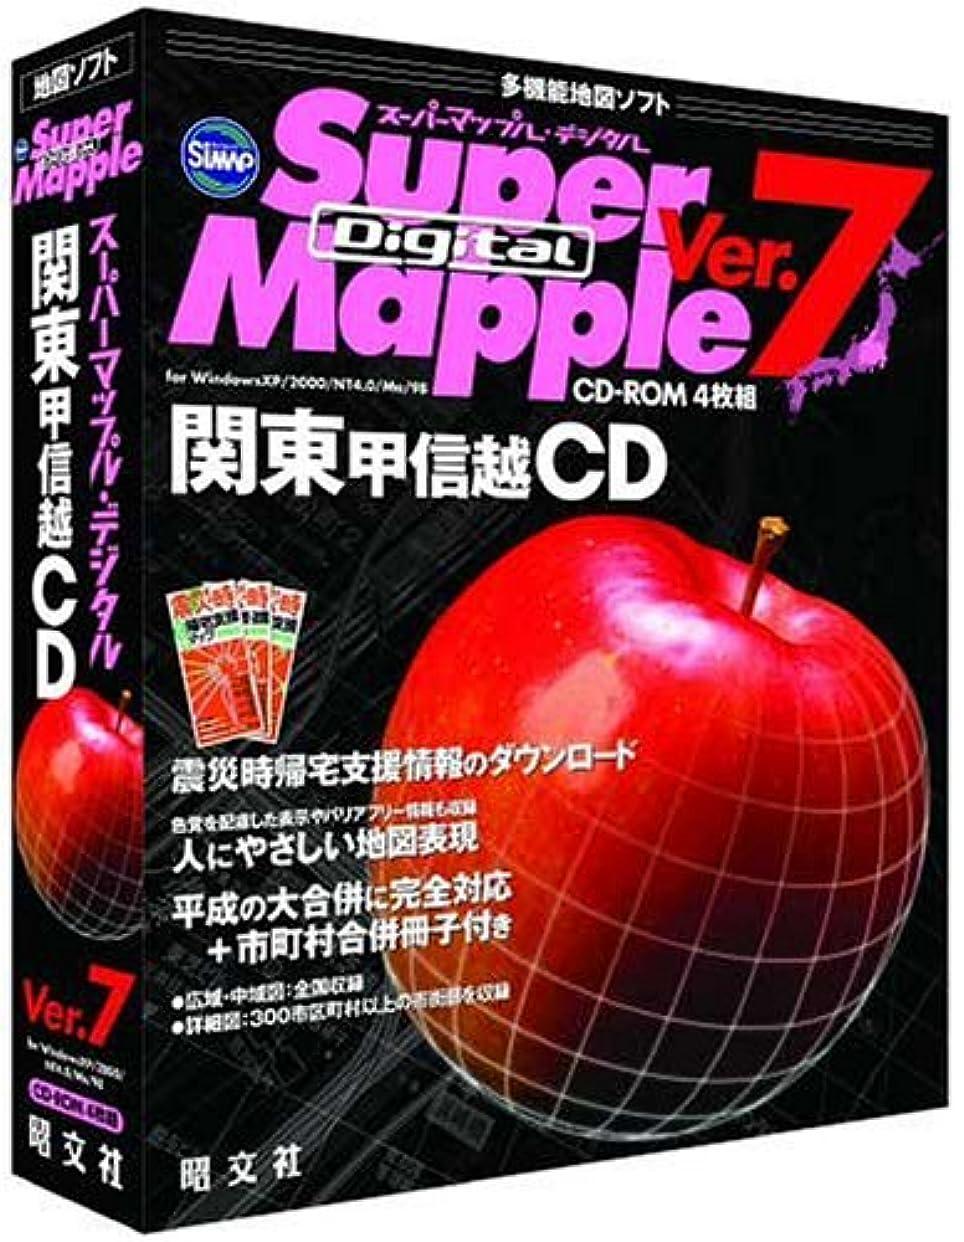 選ぶ現金添加剤Super Mapple Digital Ver.7 関東甲信越CD